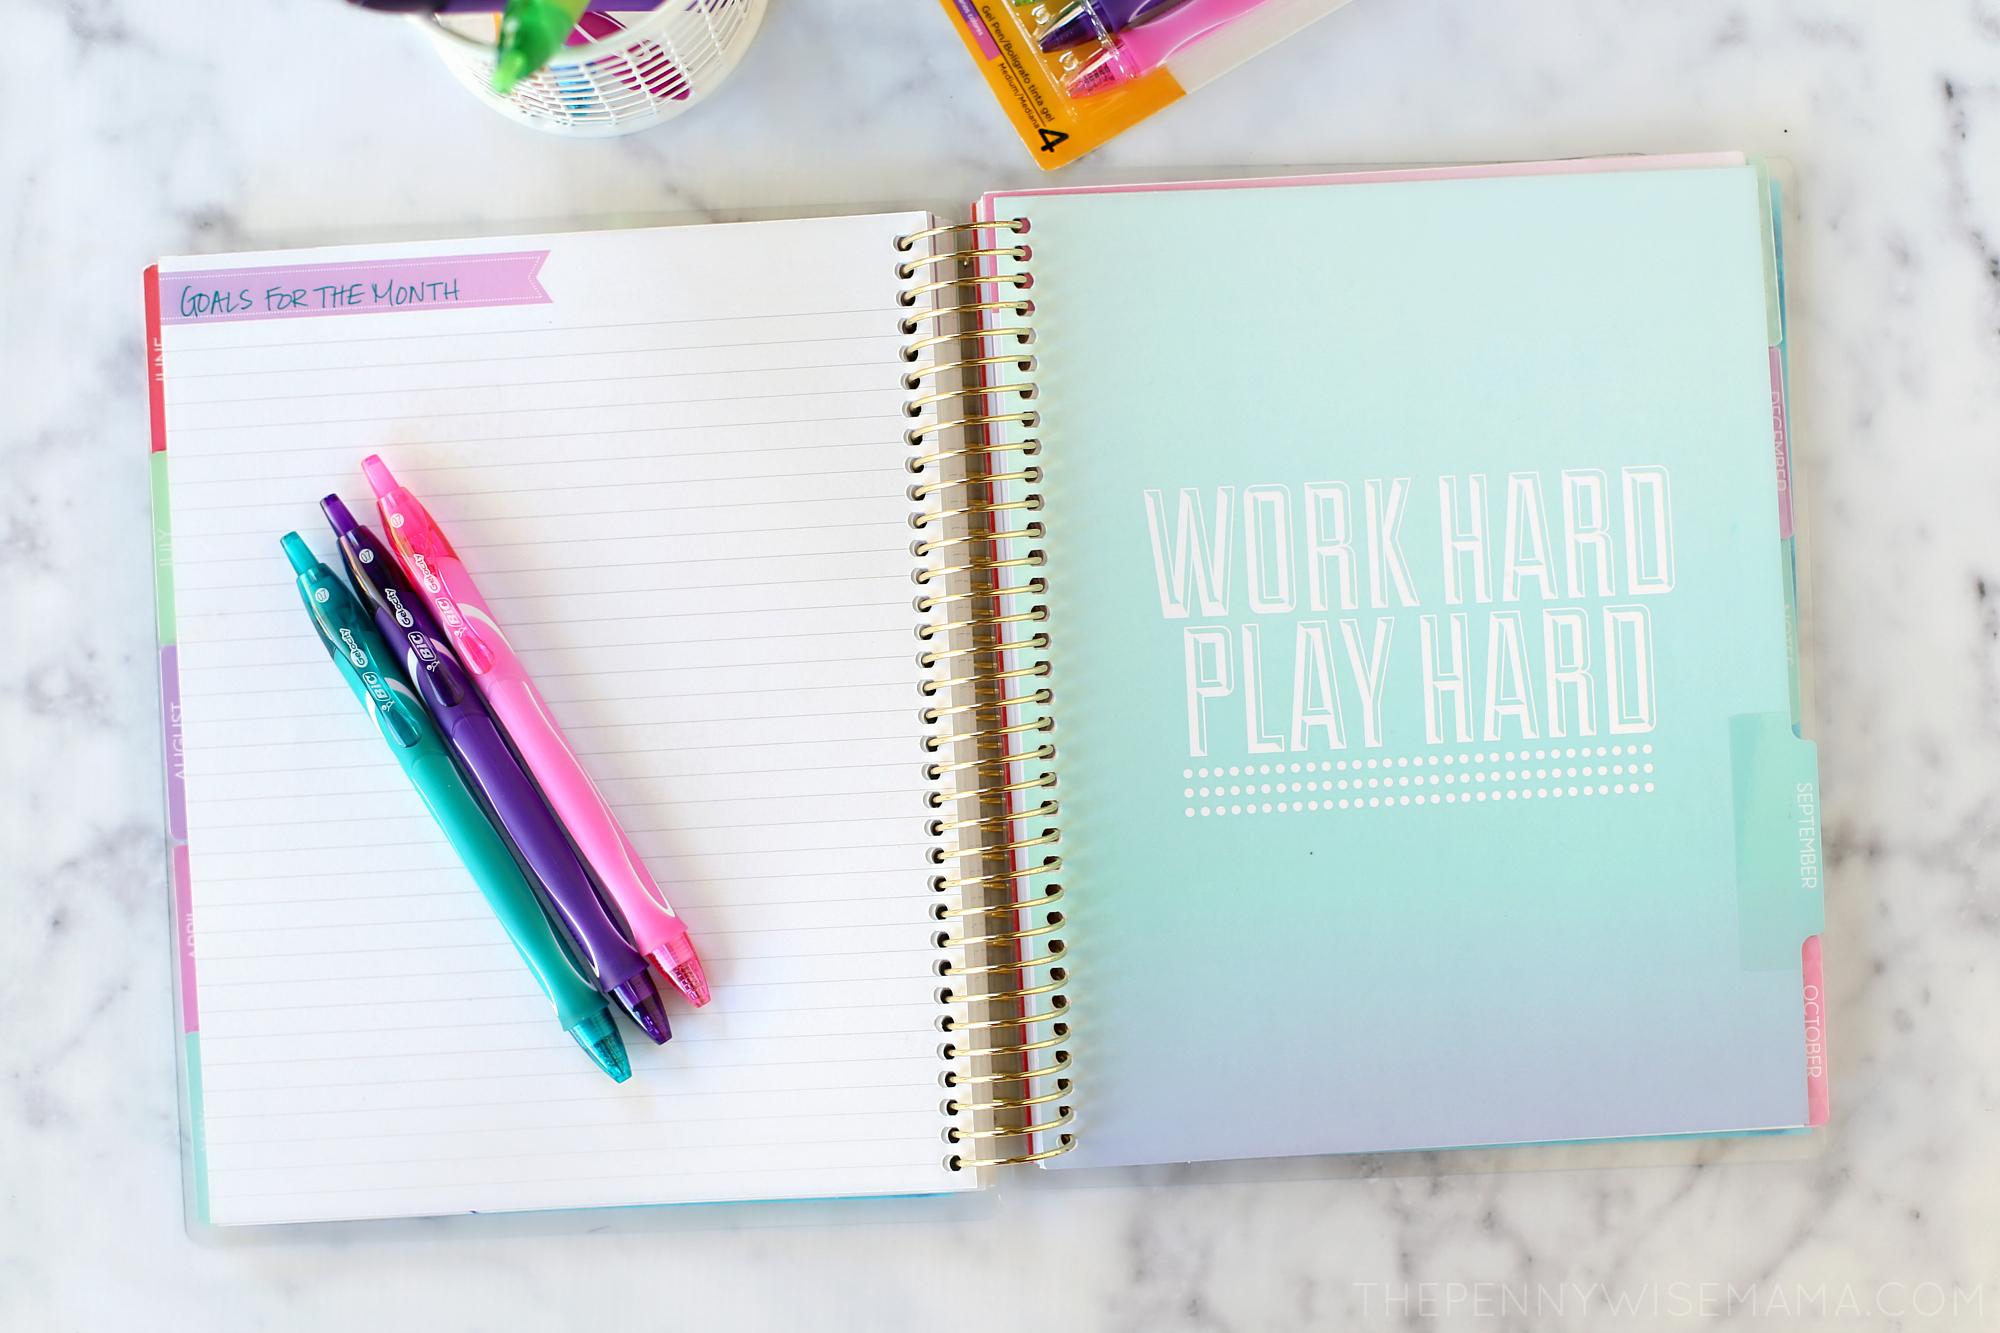 BIC Gel Pens for Planner